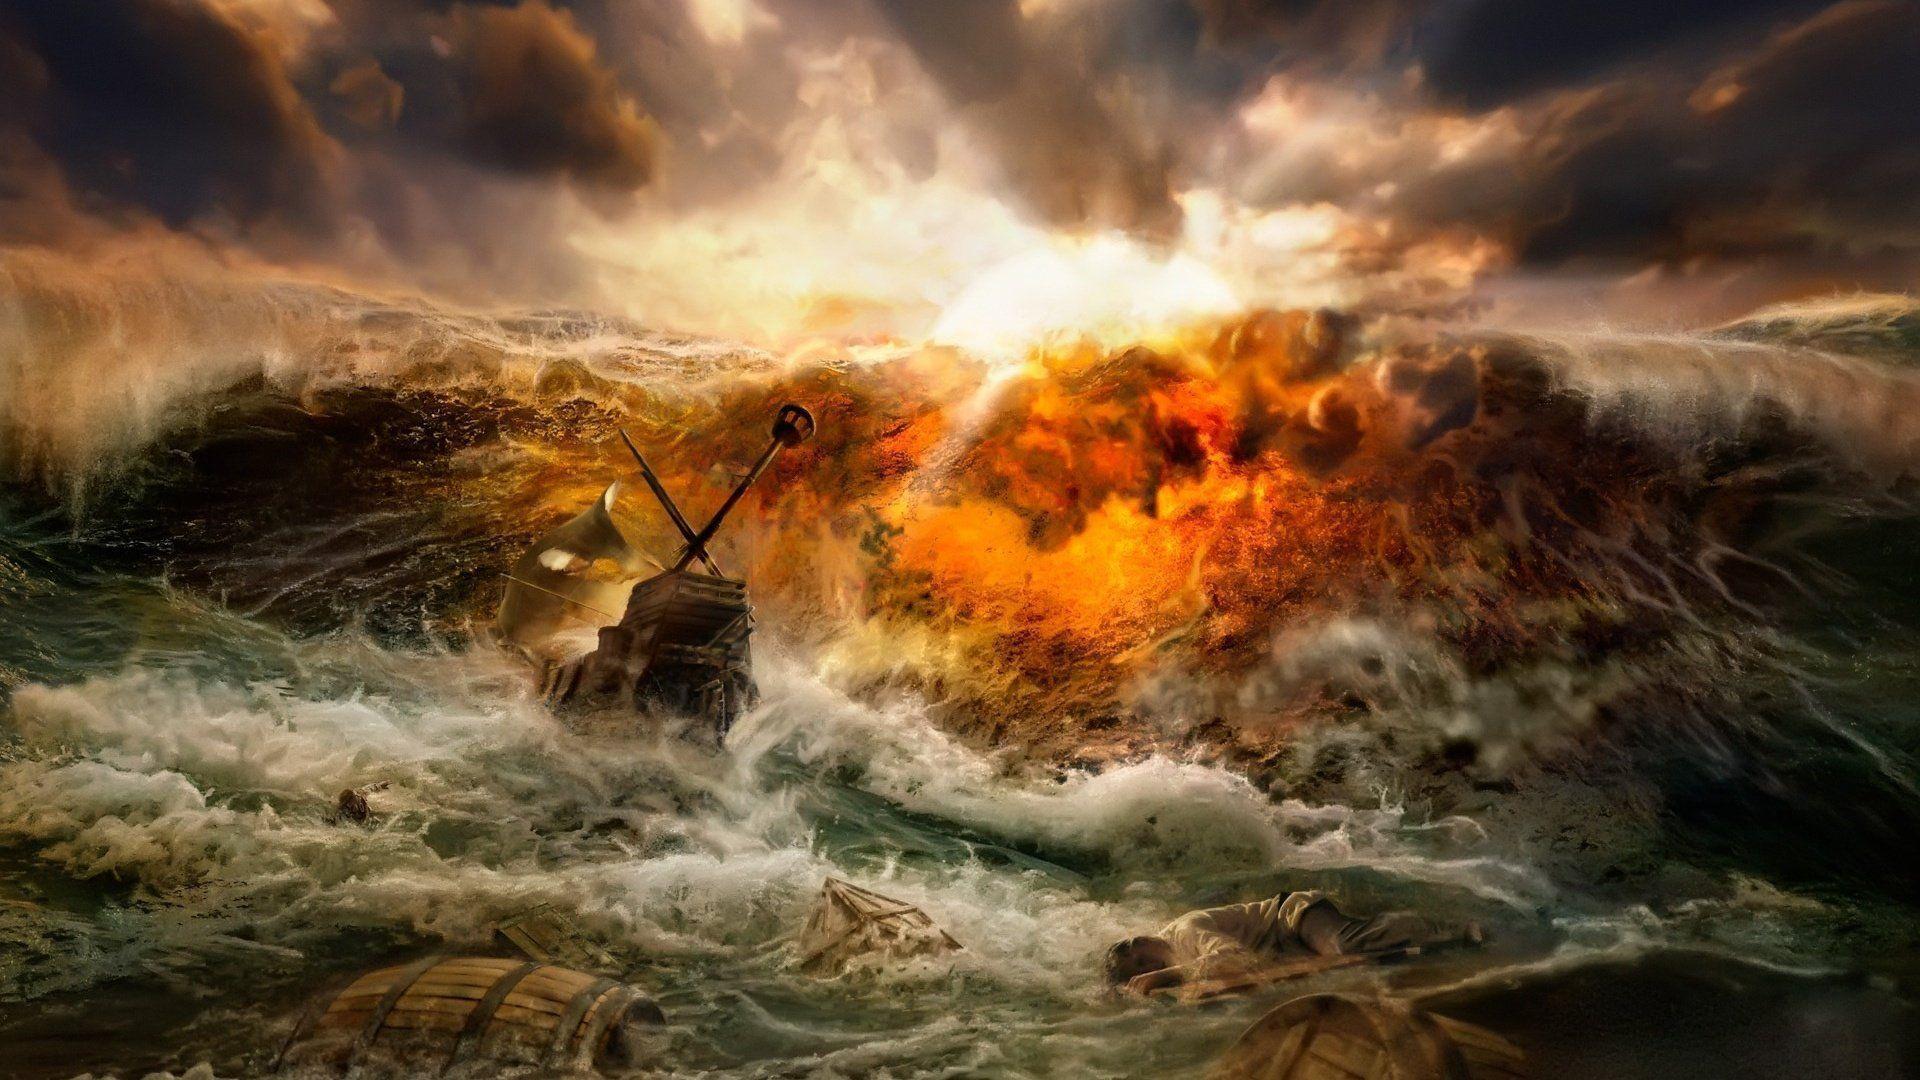 Tsunami Hd Wallpaper